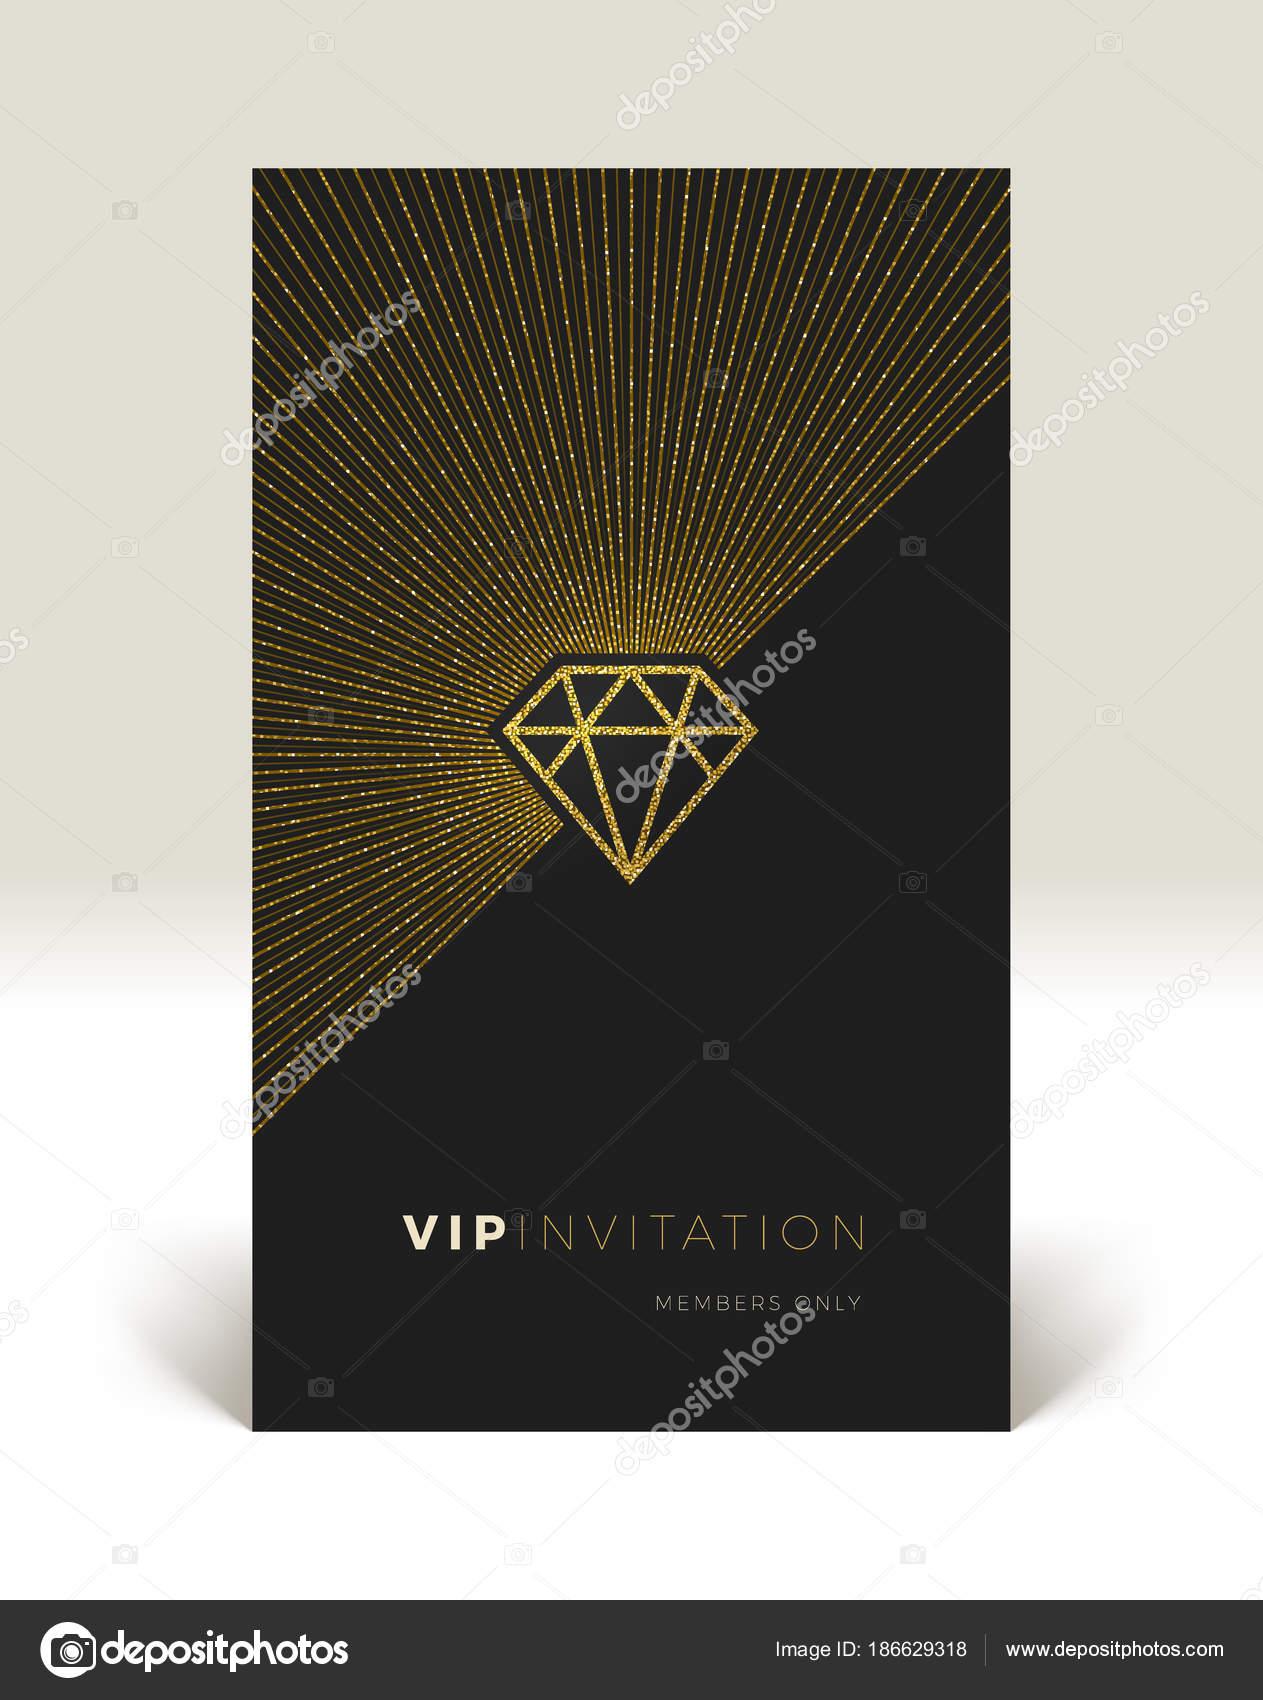 Template of vip invitation glitter gold shining diamond with template of vip invitation glitter gold shining diamond with sunburst on a black background vector illustration vector by s e r g o stopboris Images